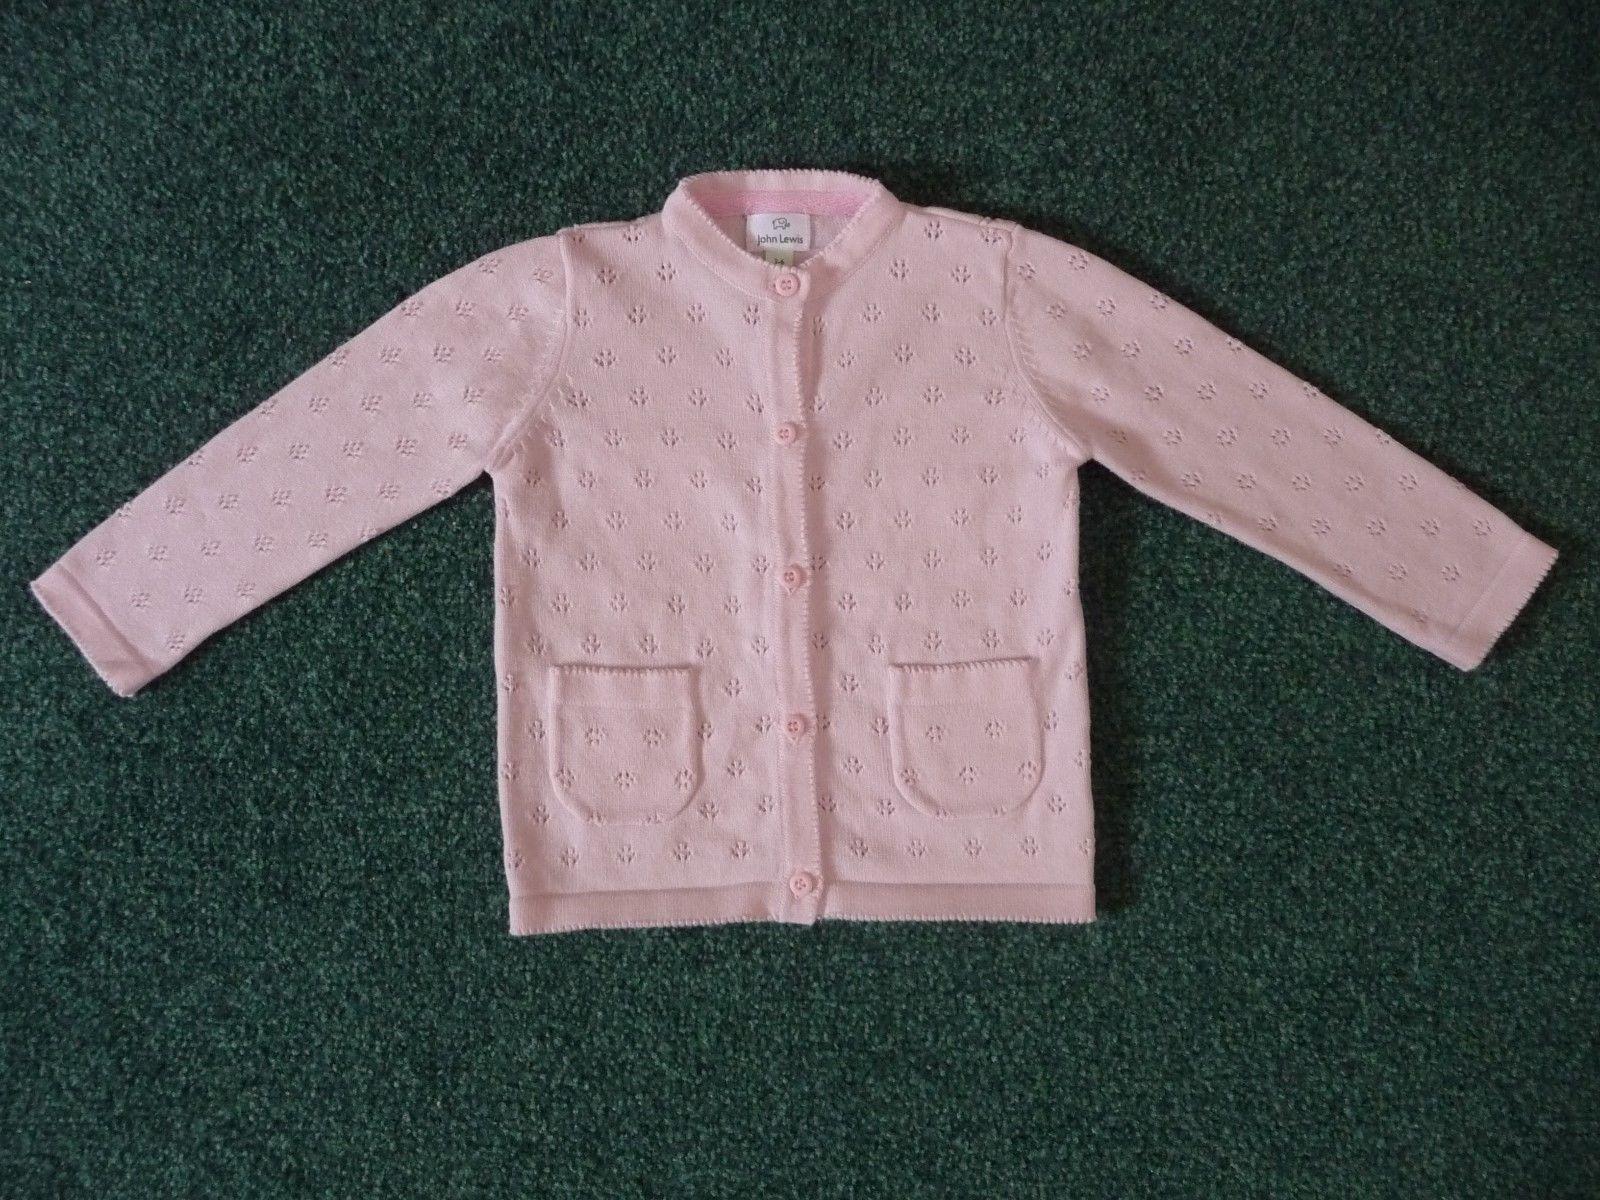 c4730d4ad47d John Lewis Baby Pink Cardigan 3-6 Months Spring Summer Baby Girl 7.4 ...